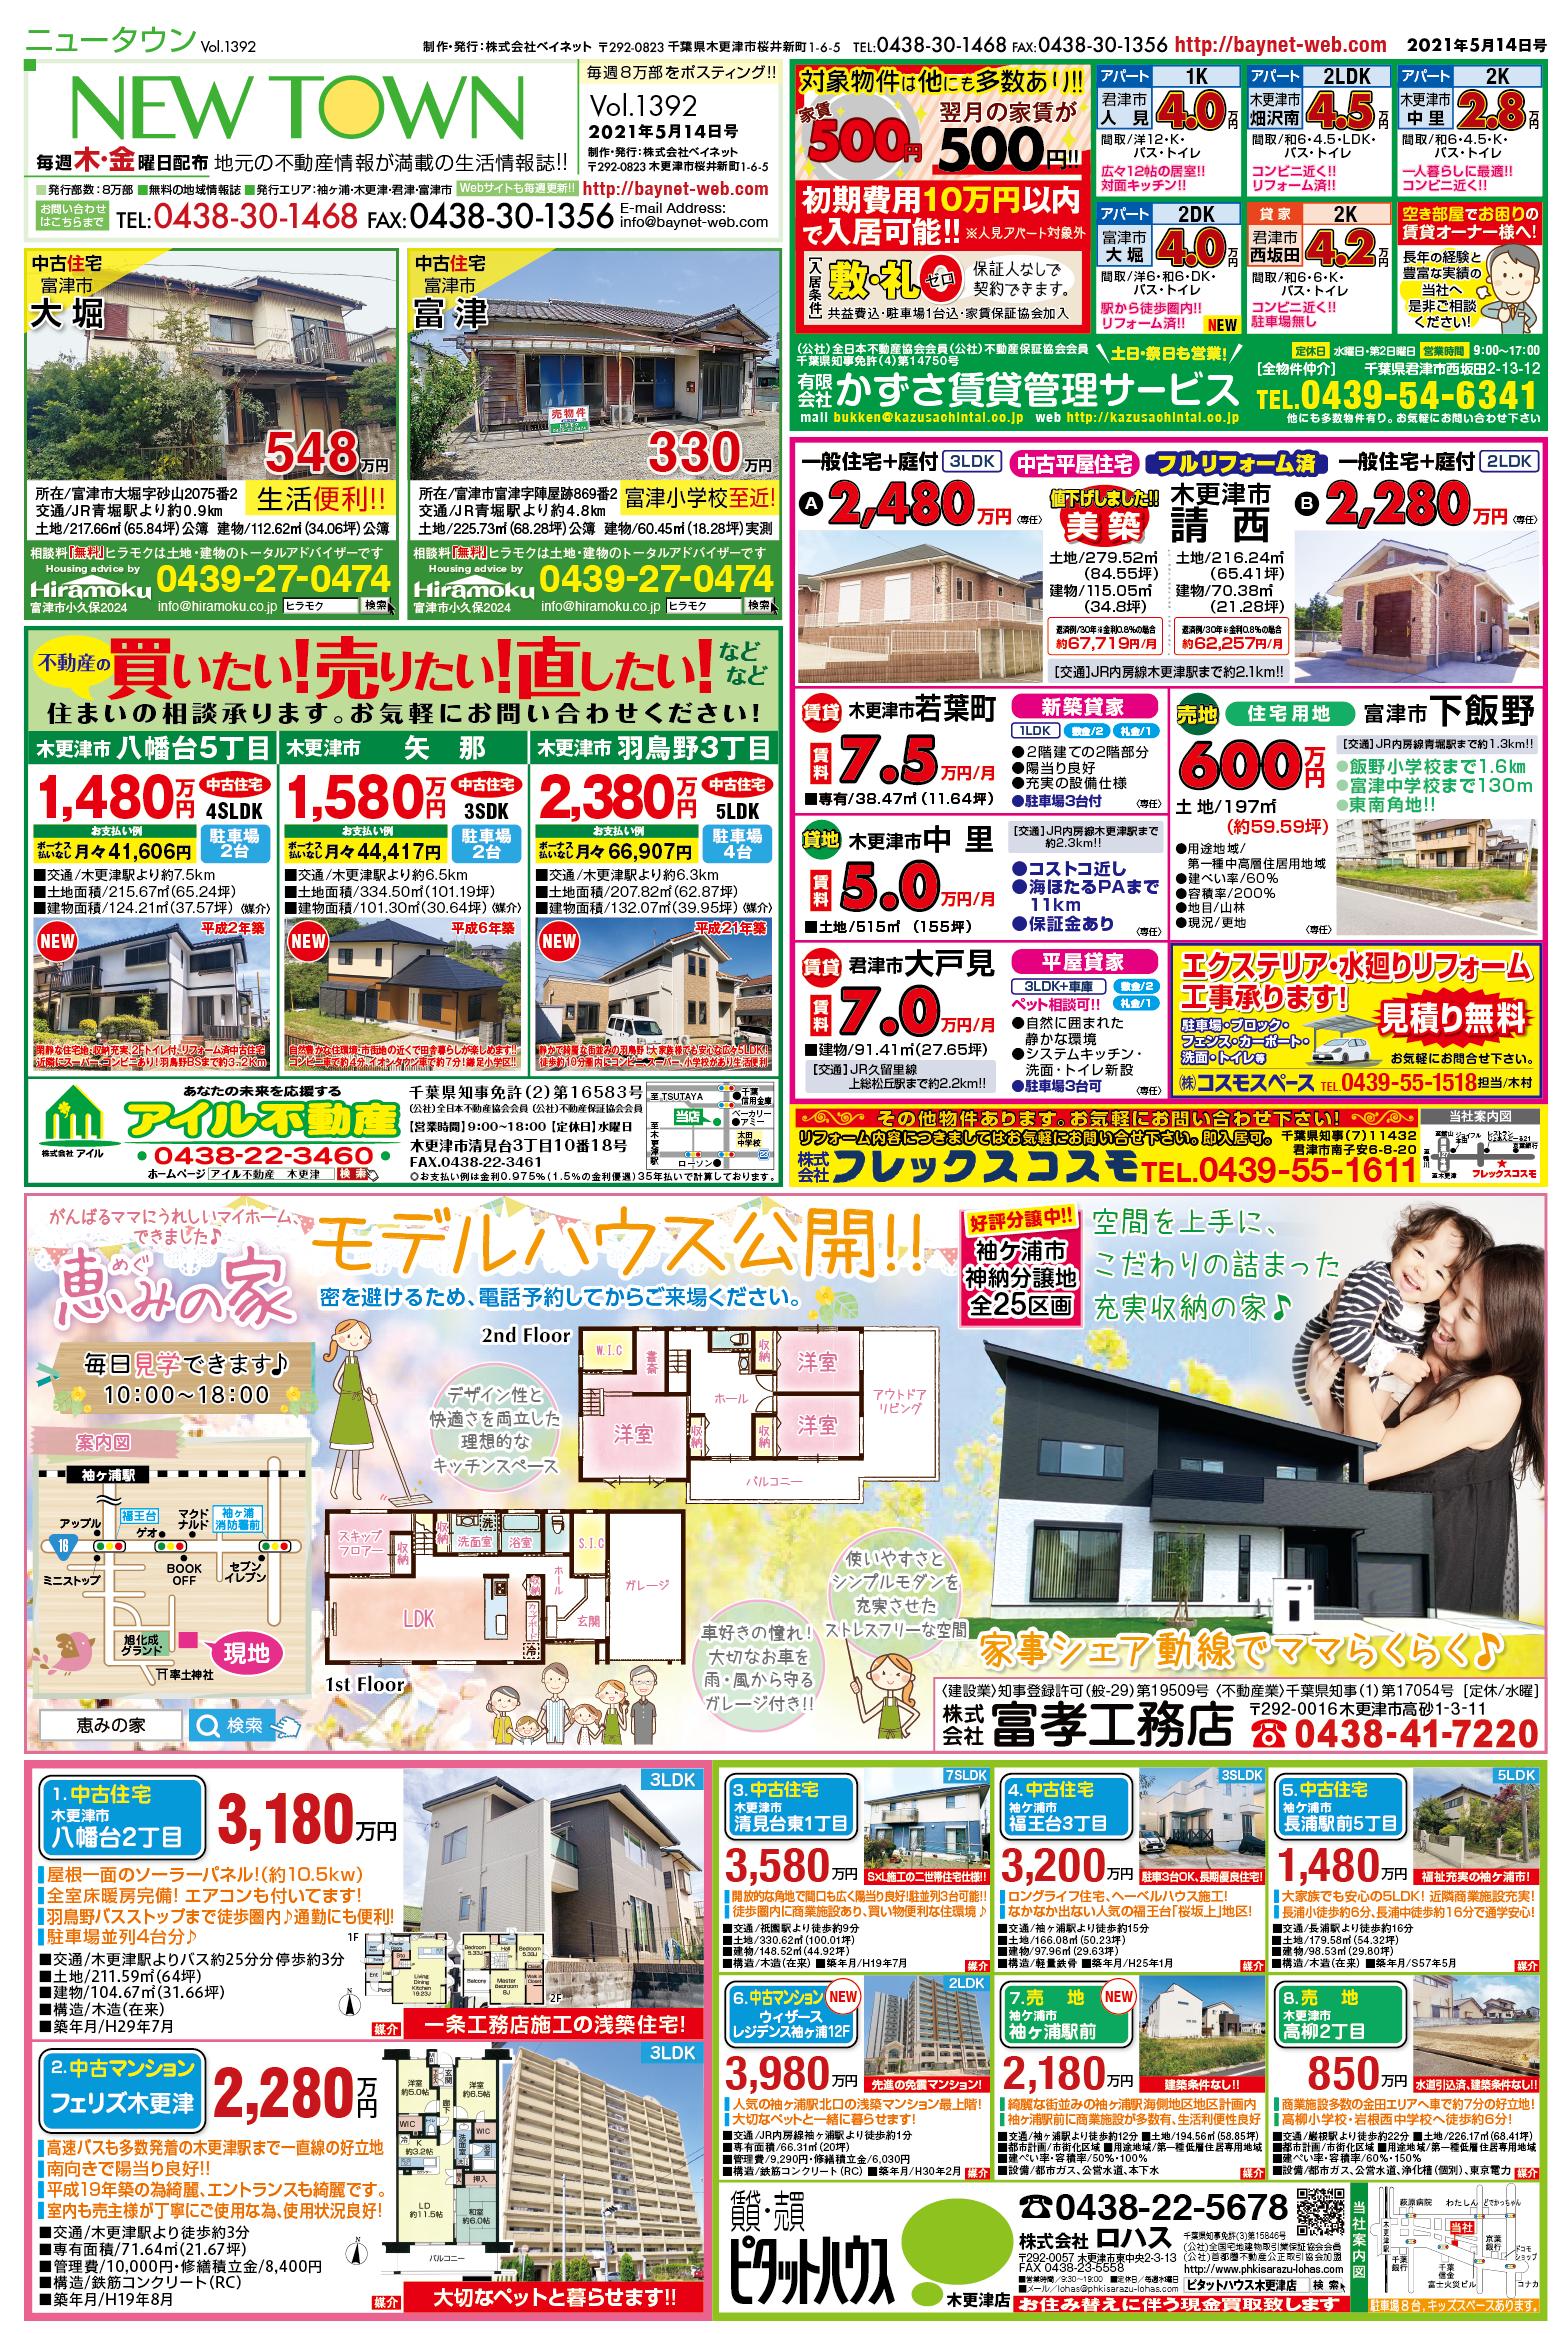 Hiramoku かずさ賃貸管理サービス アイル不動産 フレックスコスモ 富孝工務店 ピタットハウス